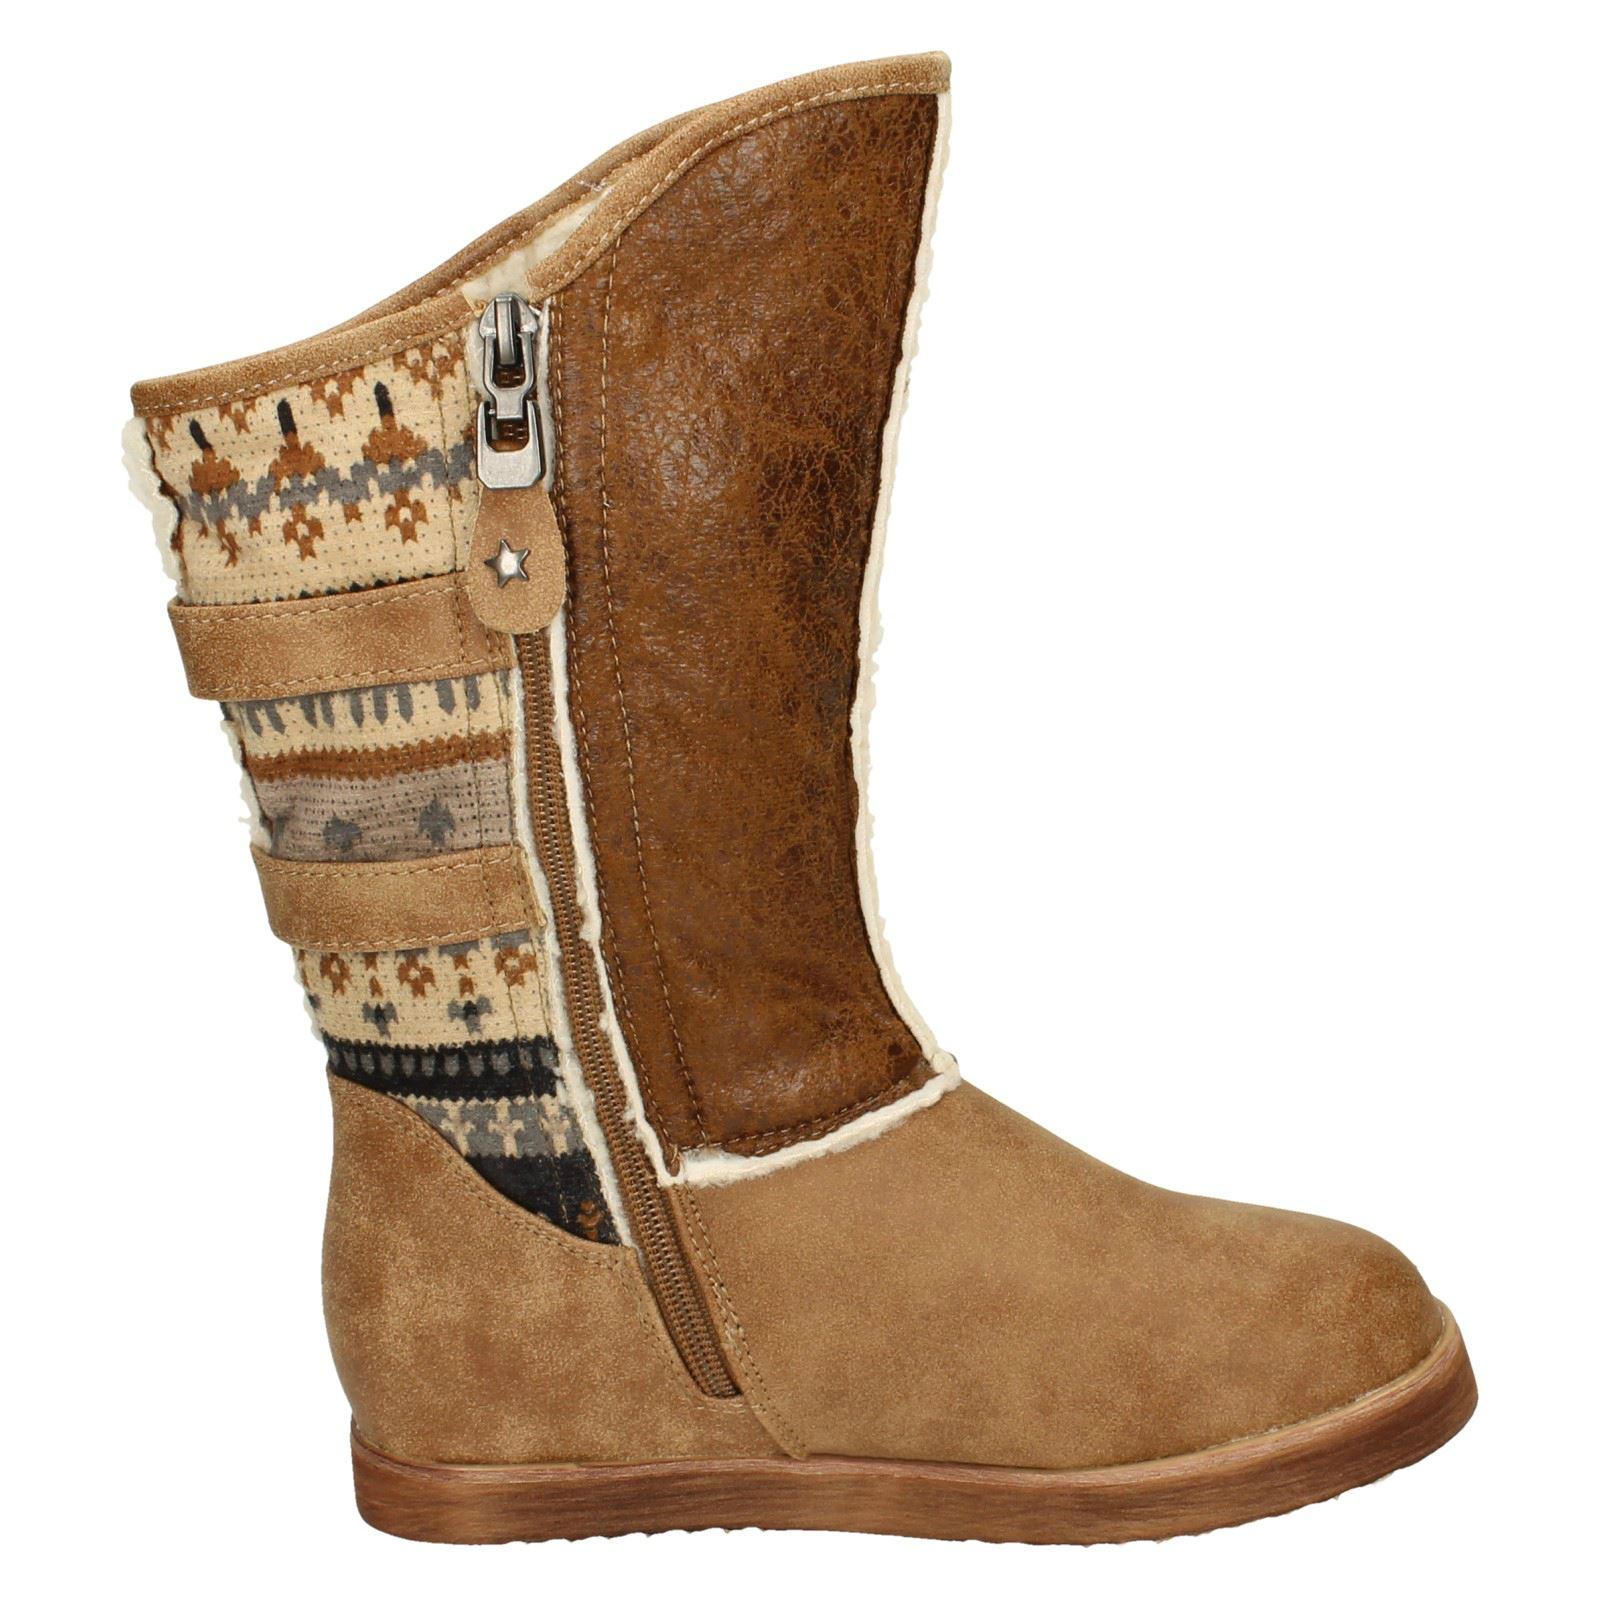 Girls Spot On Zip Up Boots With Fleece Trim